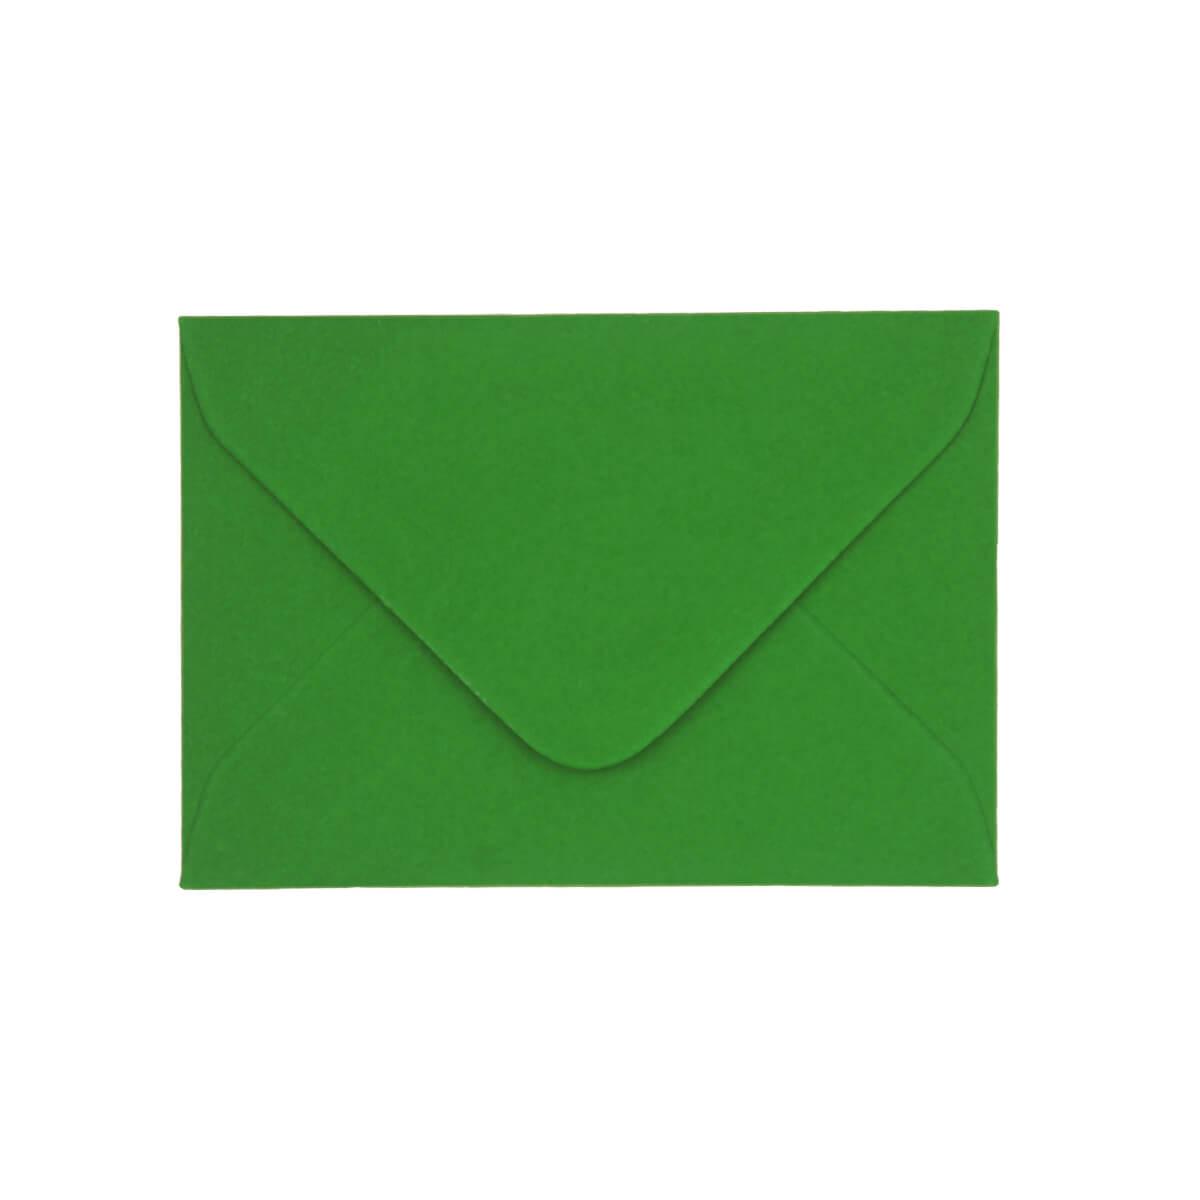 XMAS GREEN 70 x 100 mm GIFT TAG ENVELOPE (i2)